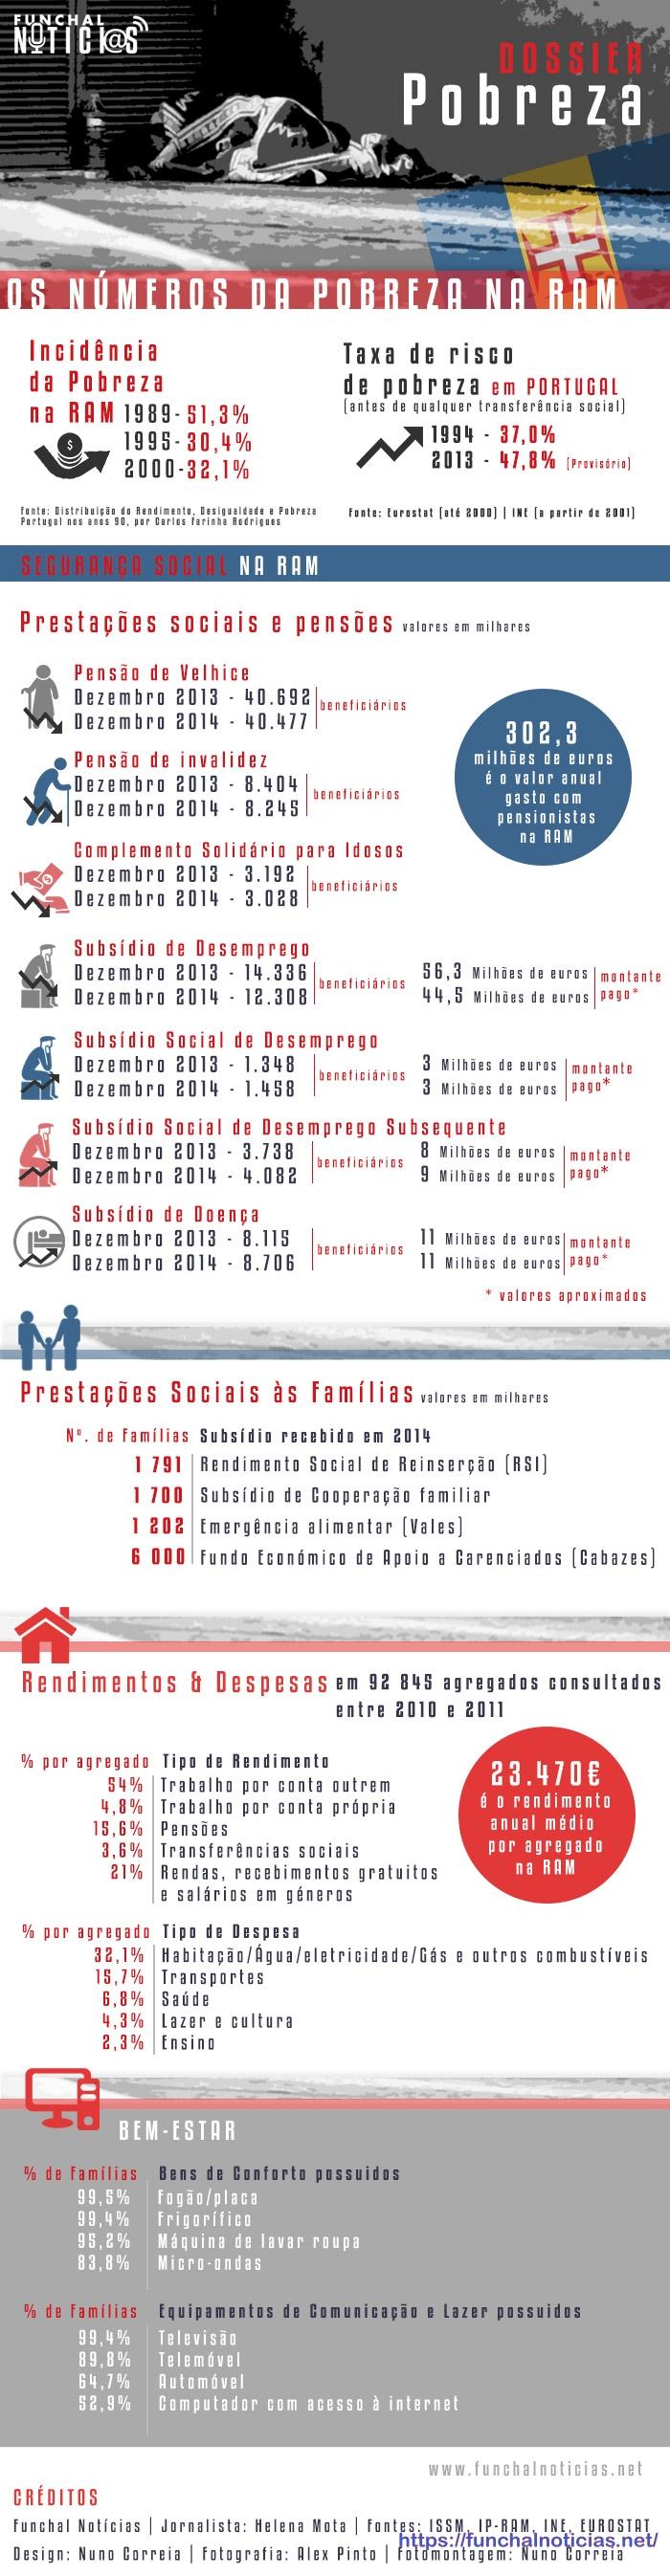 infografia---pobreza-final